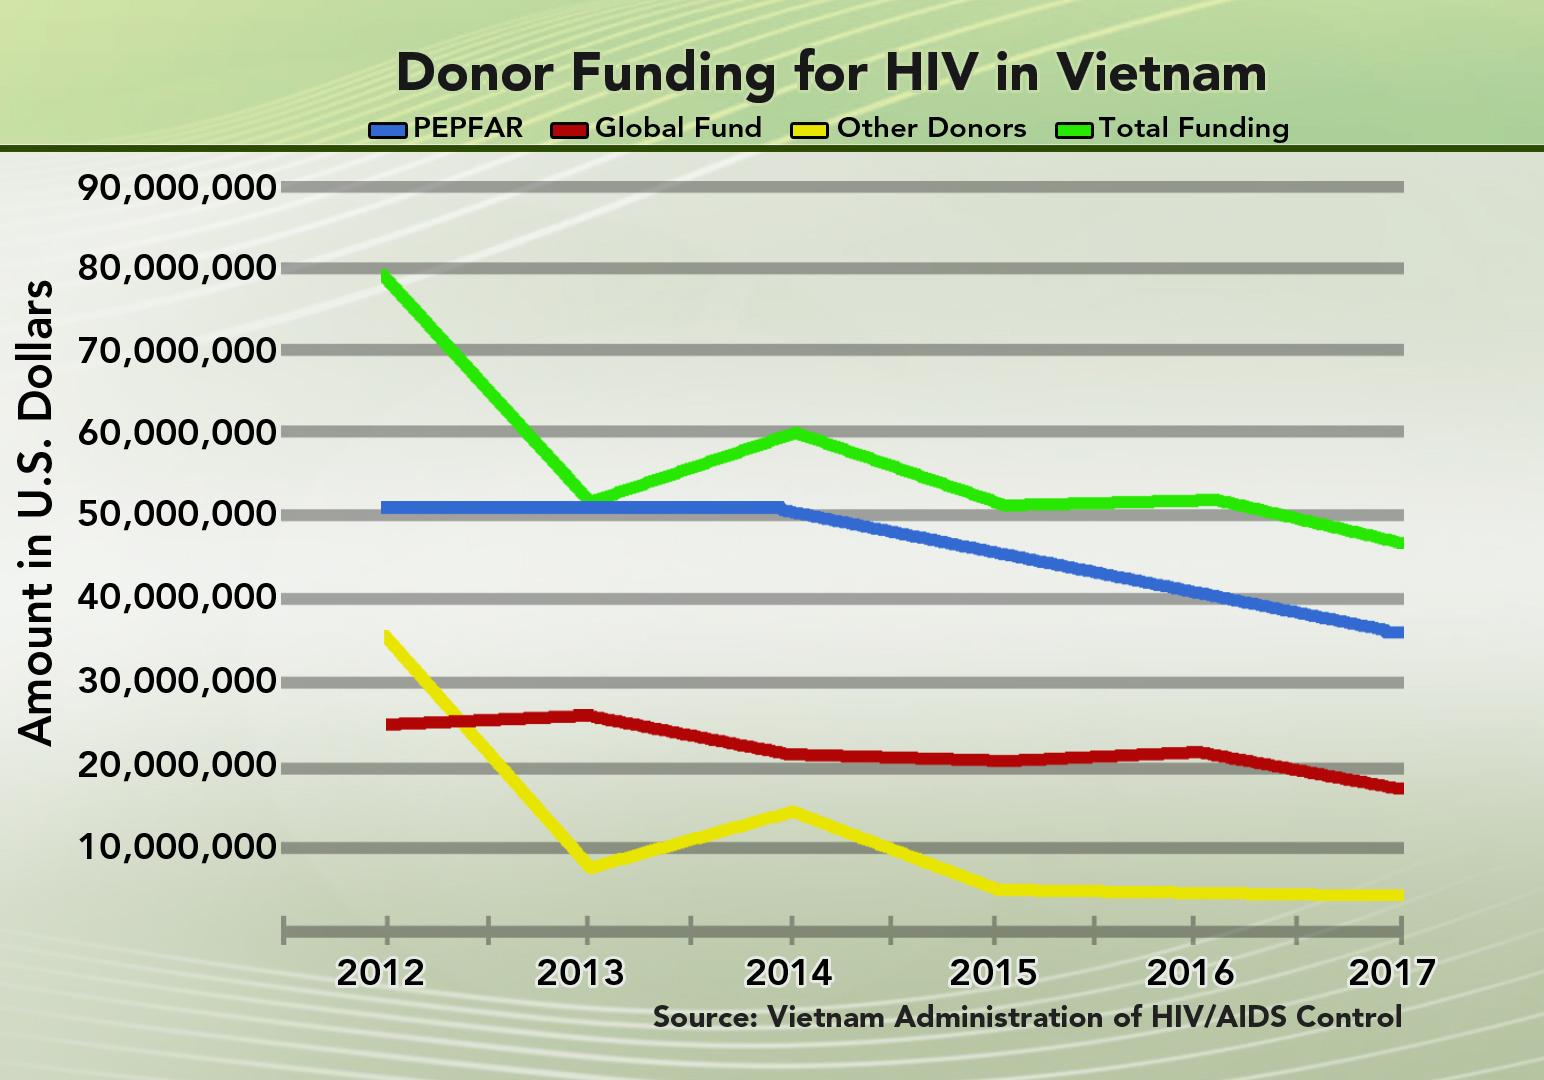 Vietnam donor funding